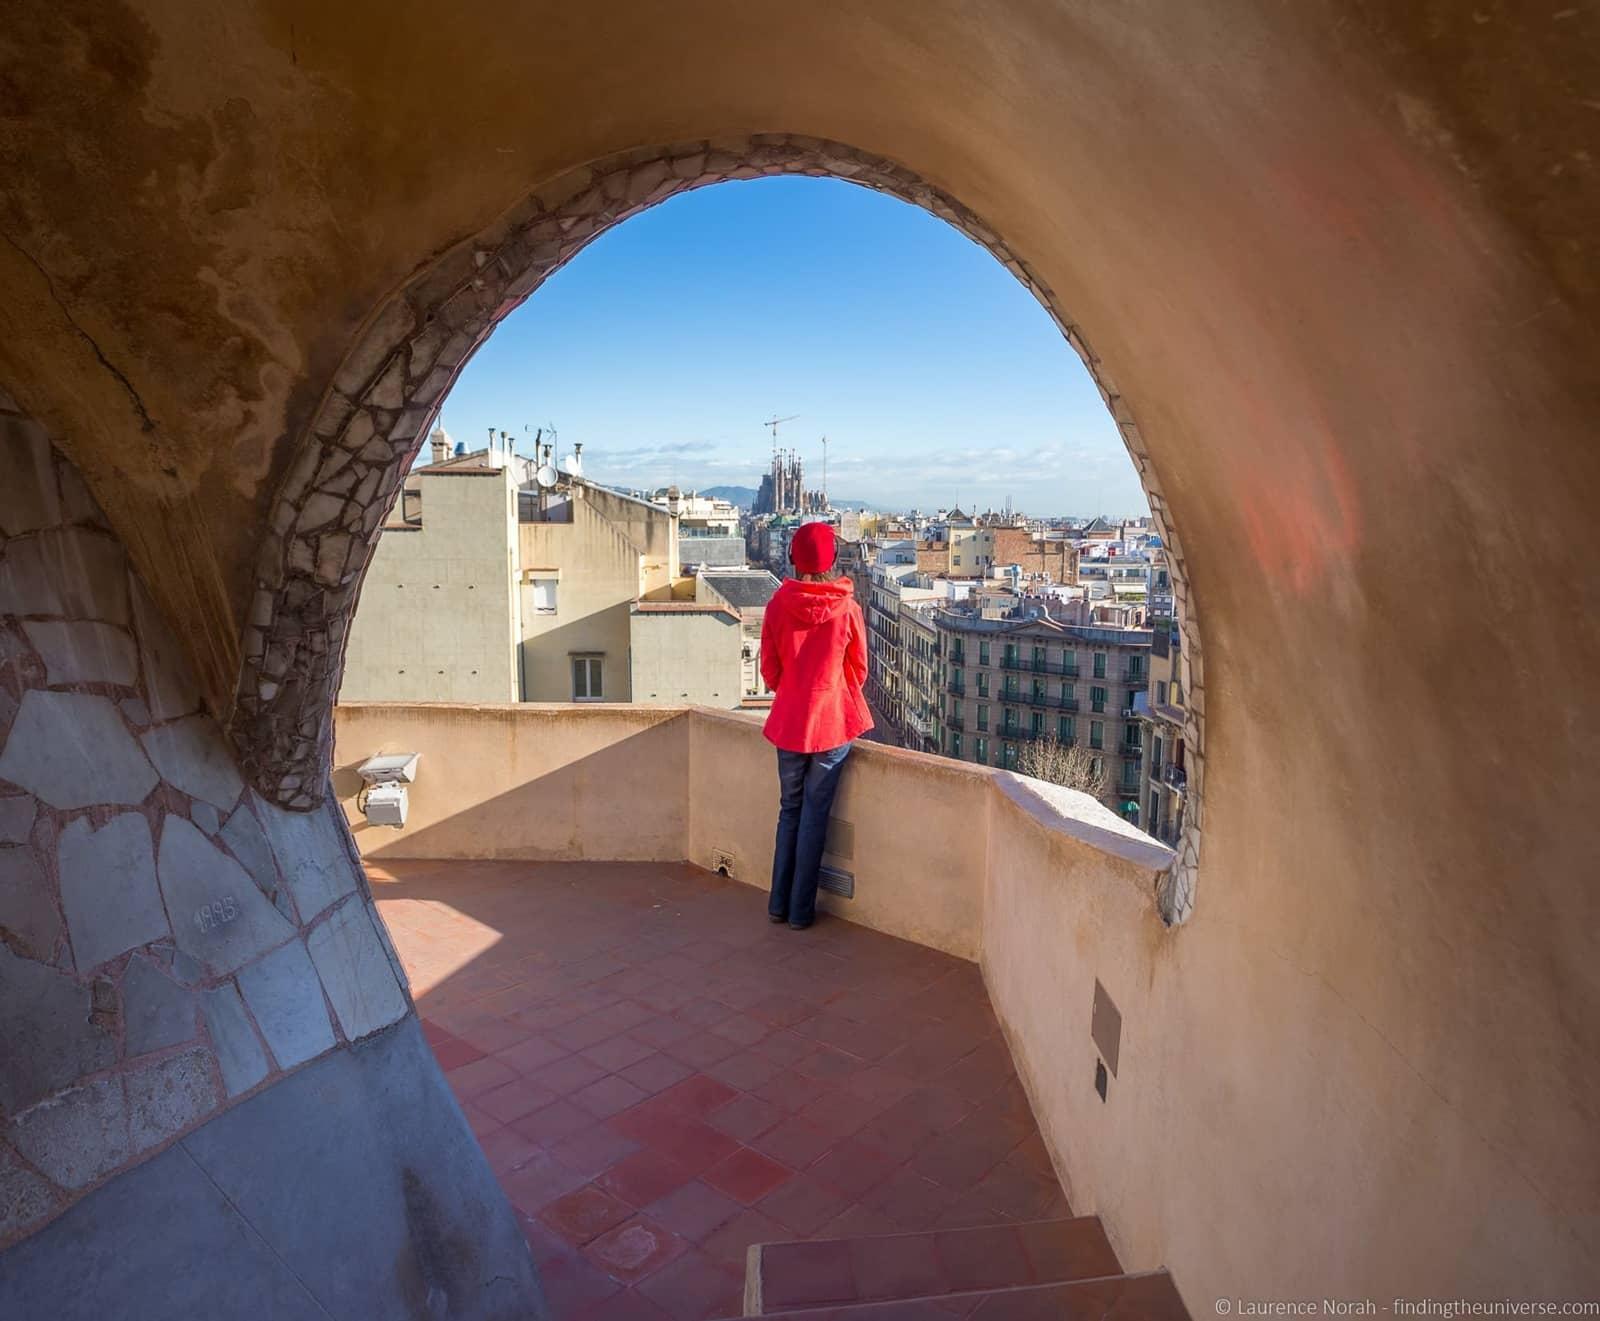 [Casa+Mil%C3%A1+Barcelona_by_Laurence+Norah-4%5B4%5D]